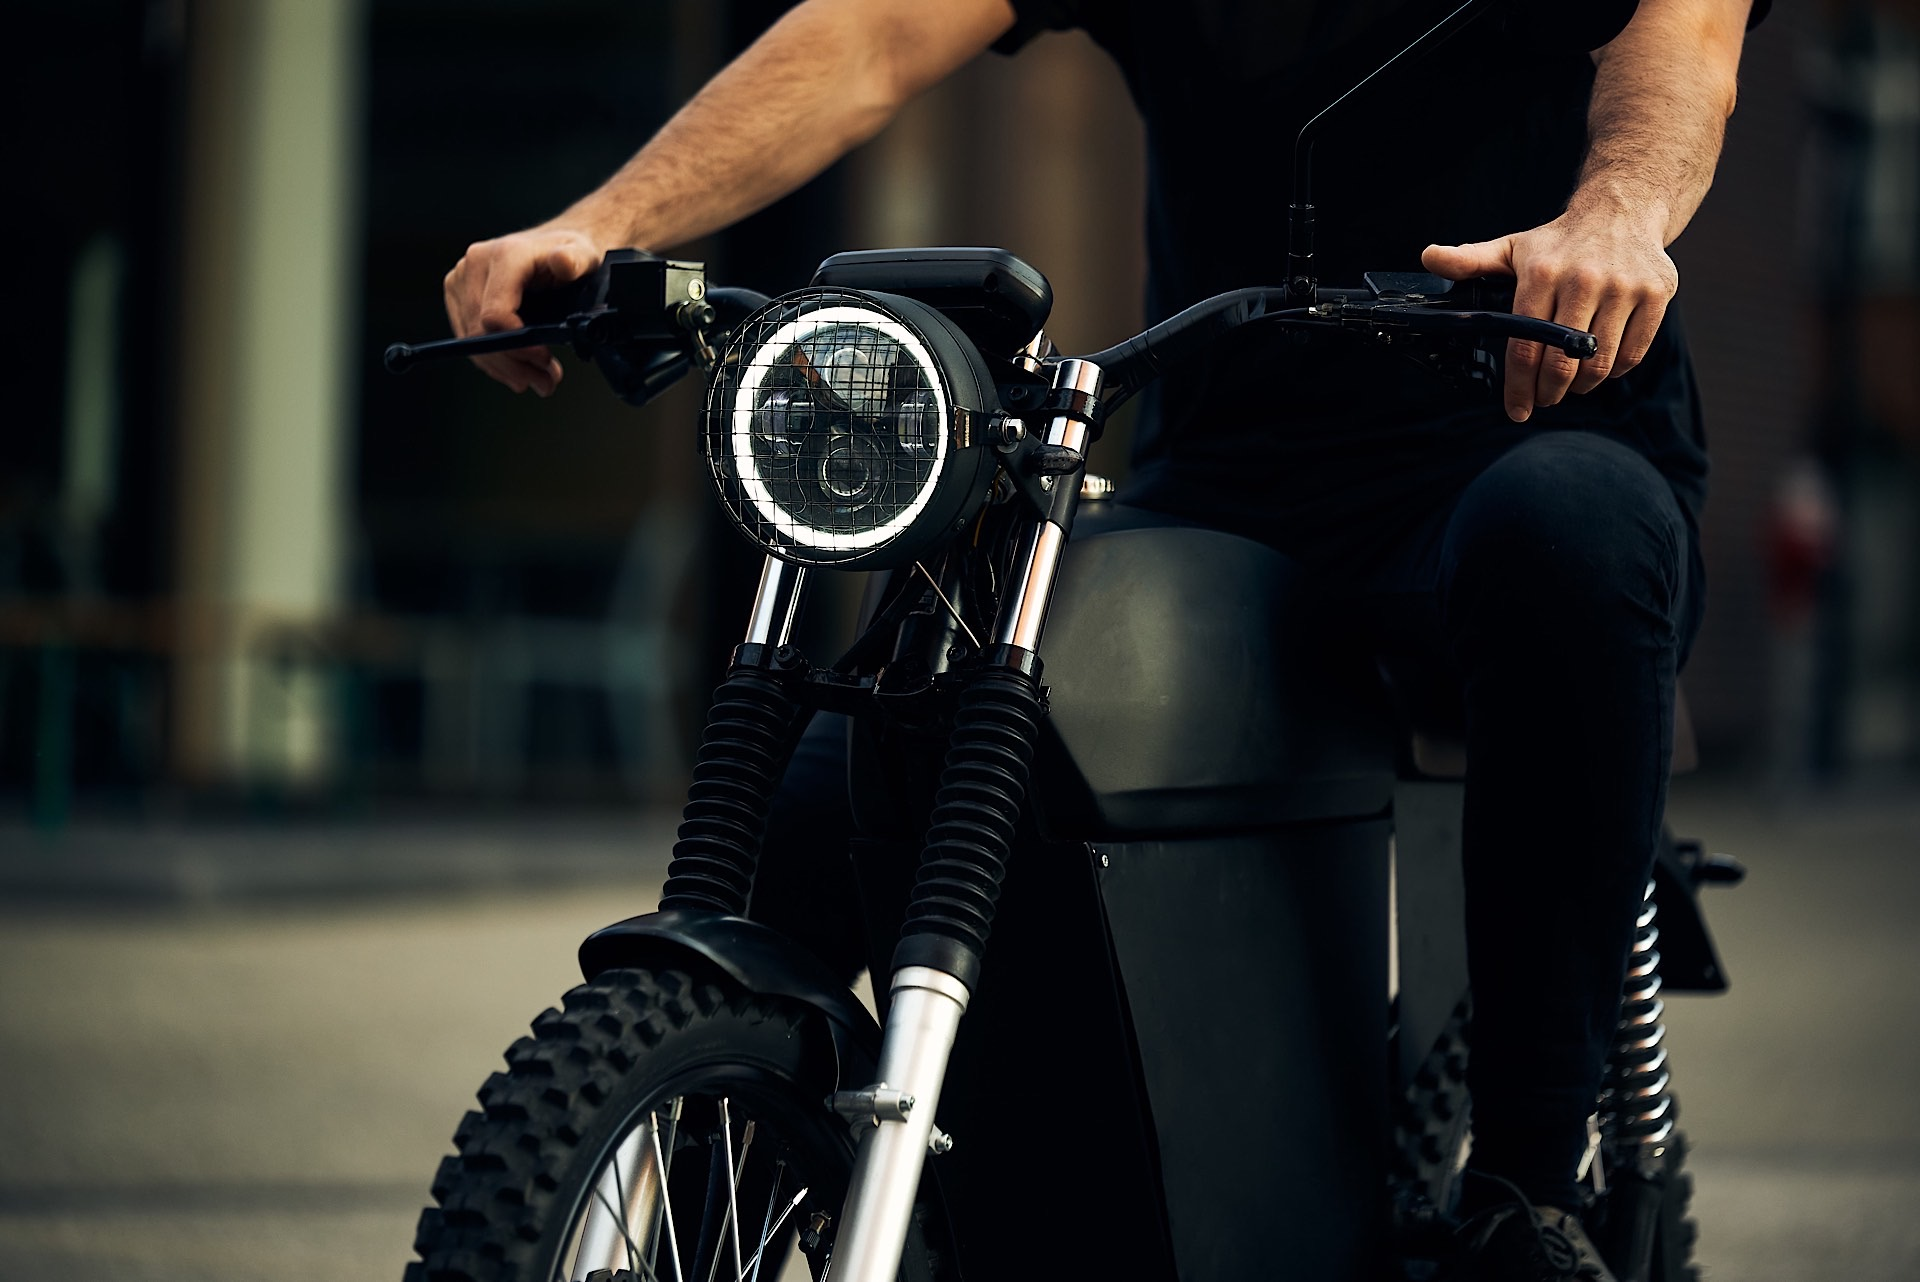 Blacktea Motorcycles